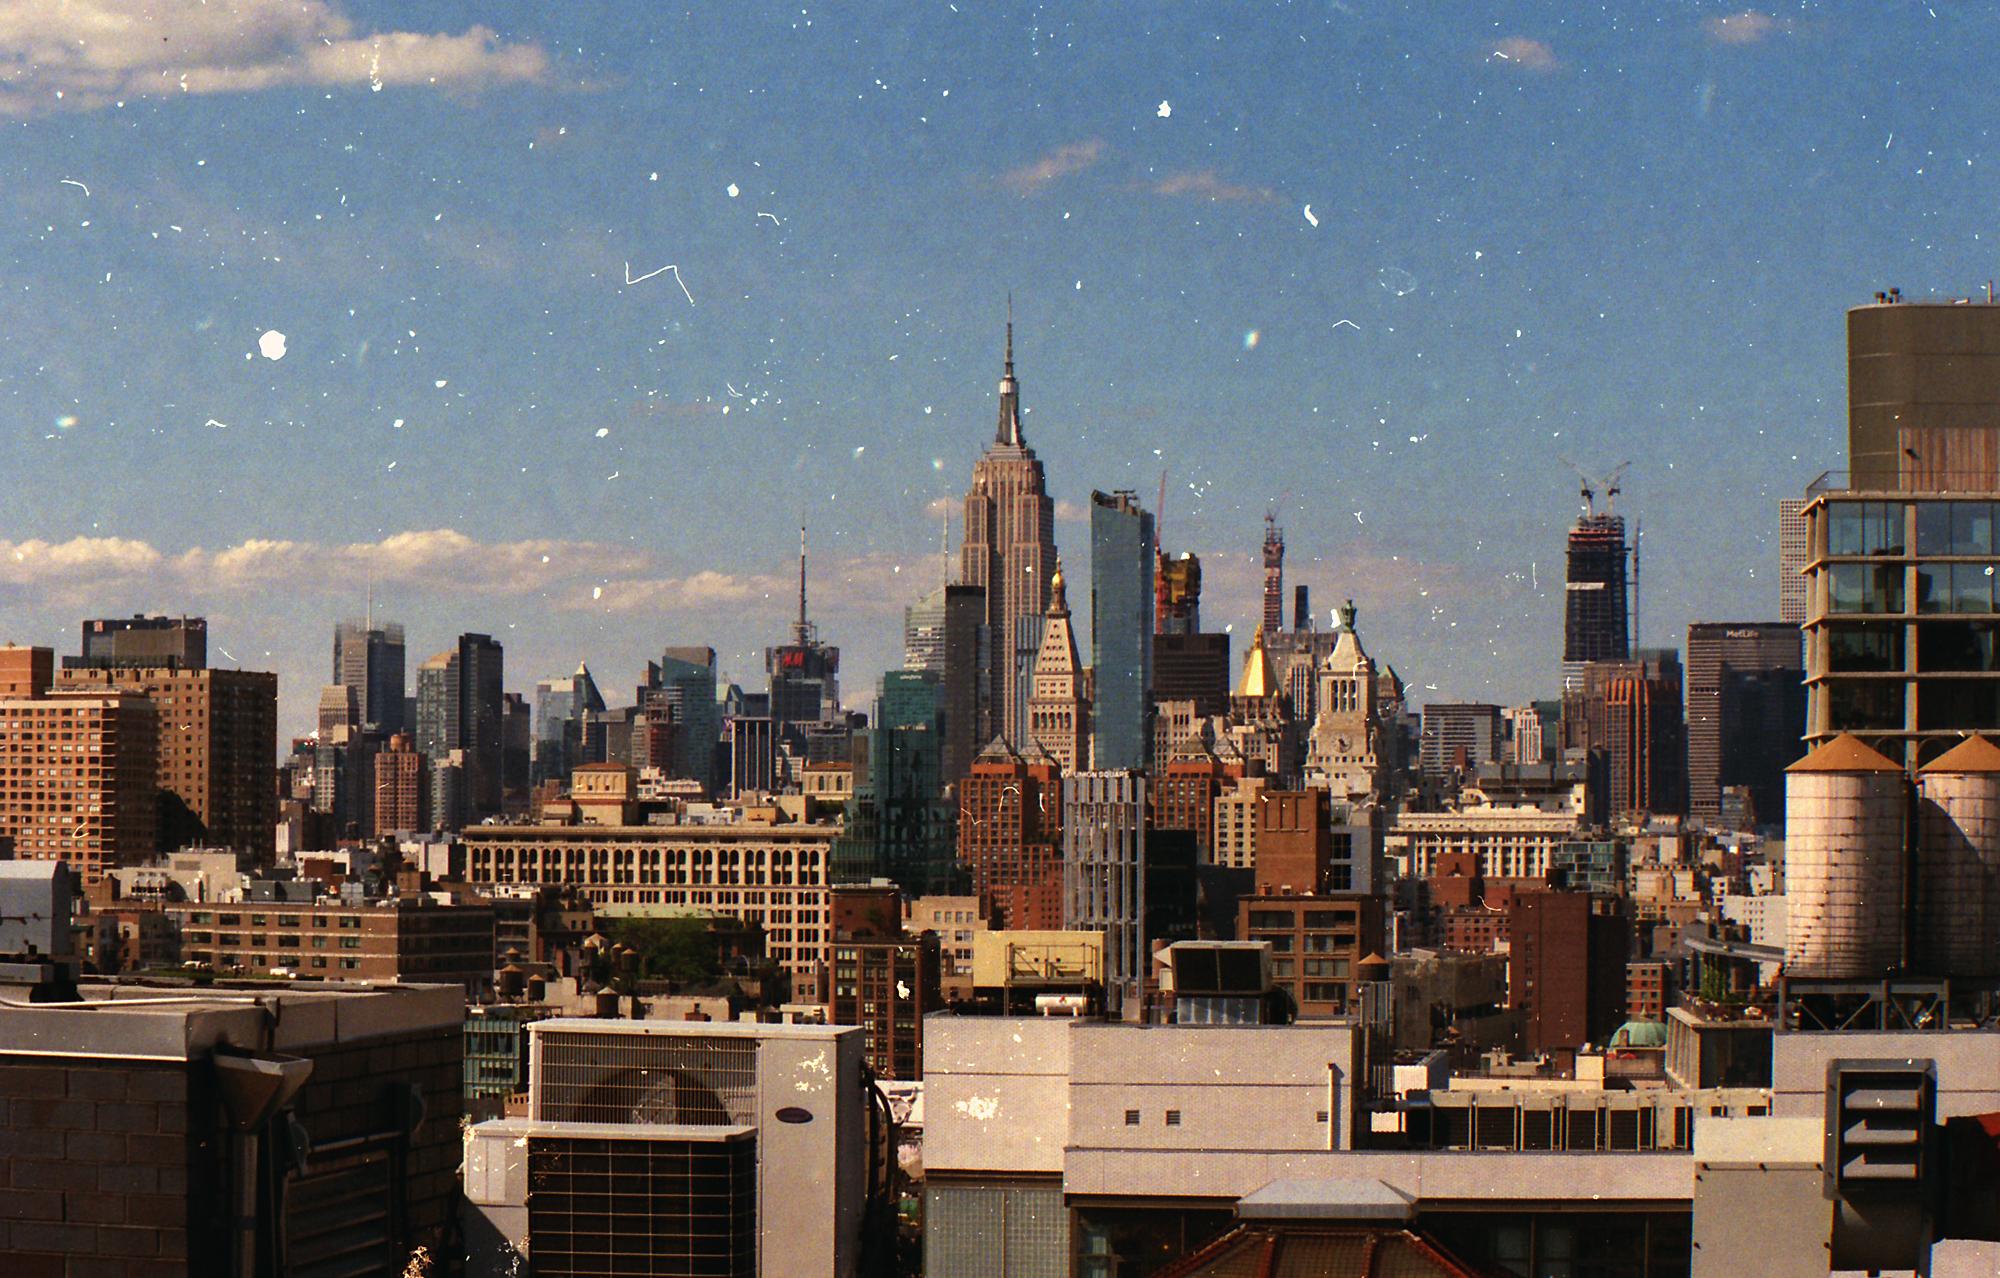 Empire State Building, New-York. Minolta XG-1, Vivitar 80-200mm, Kodak Portra 800